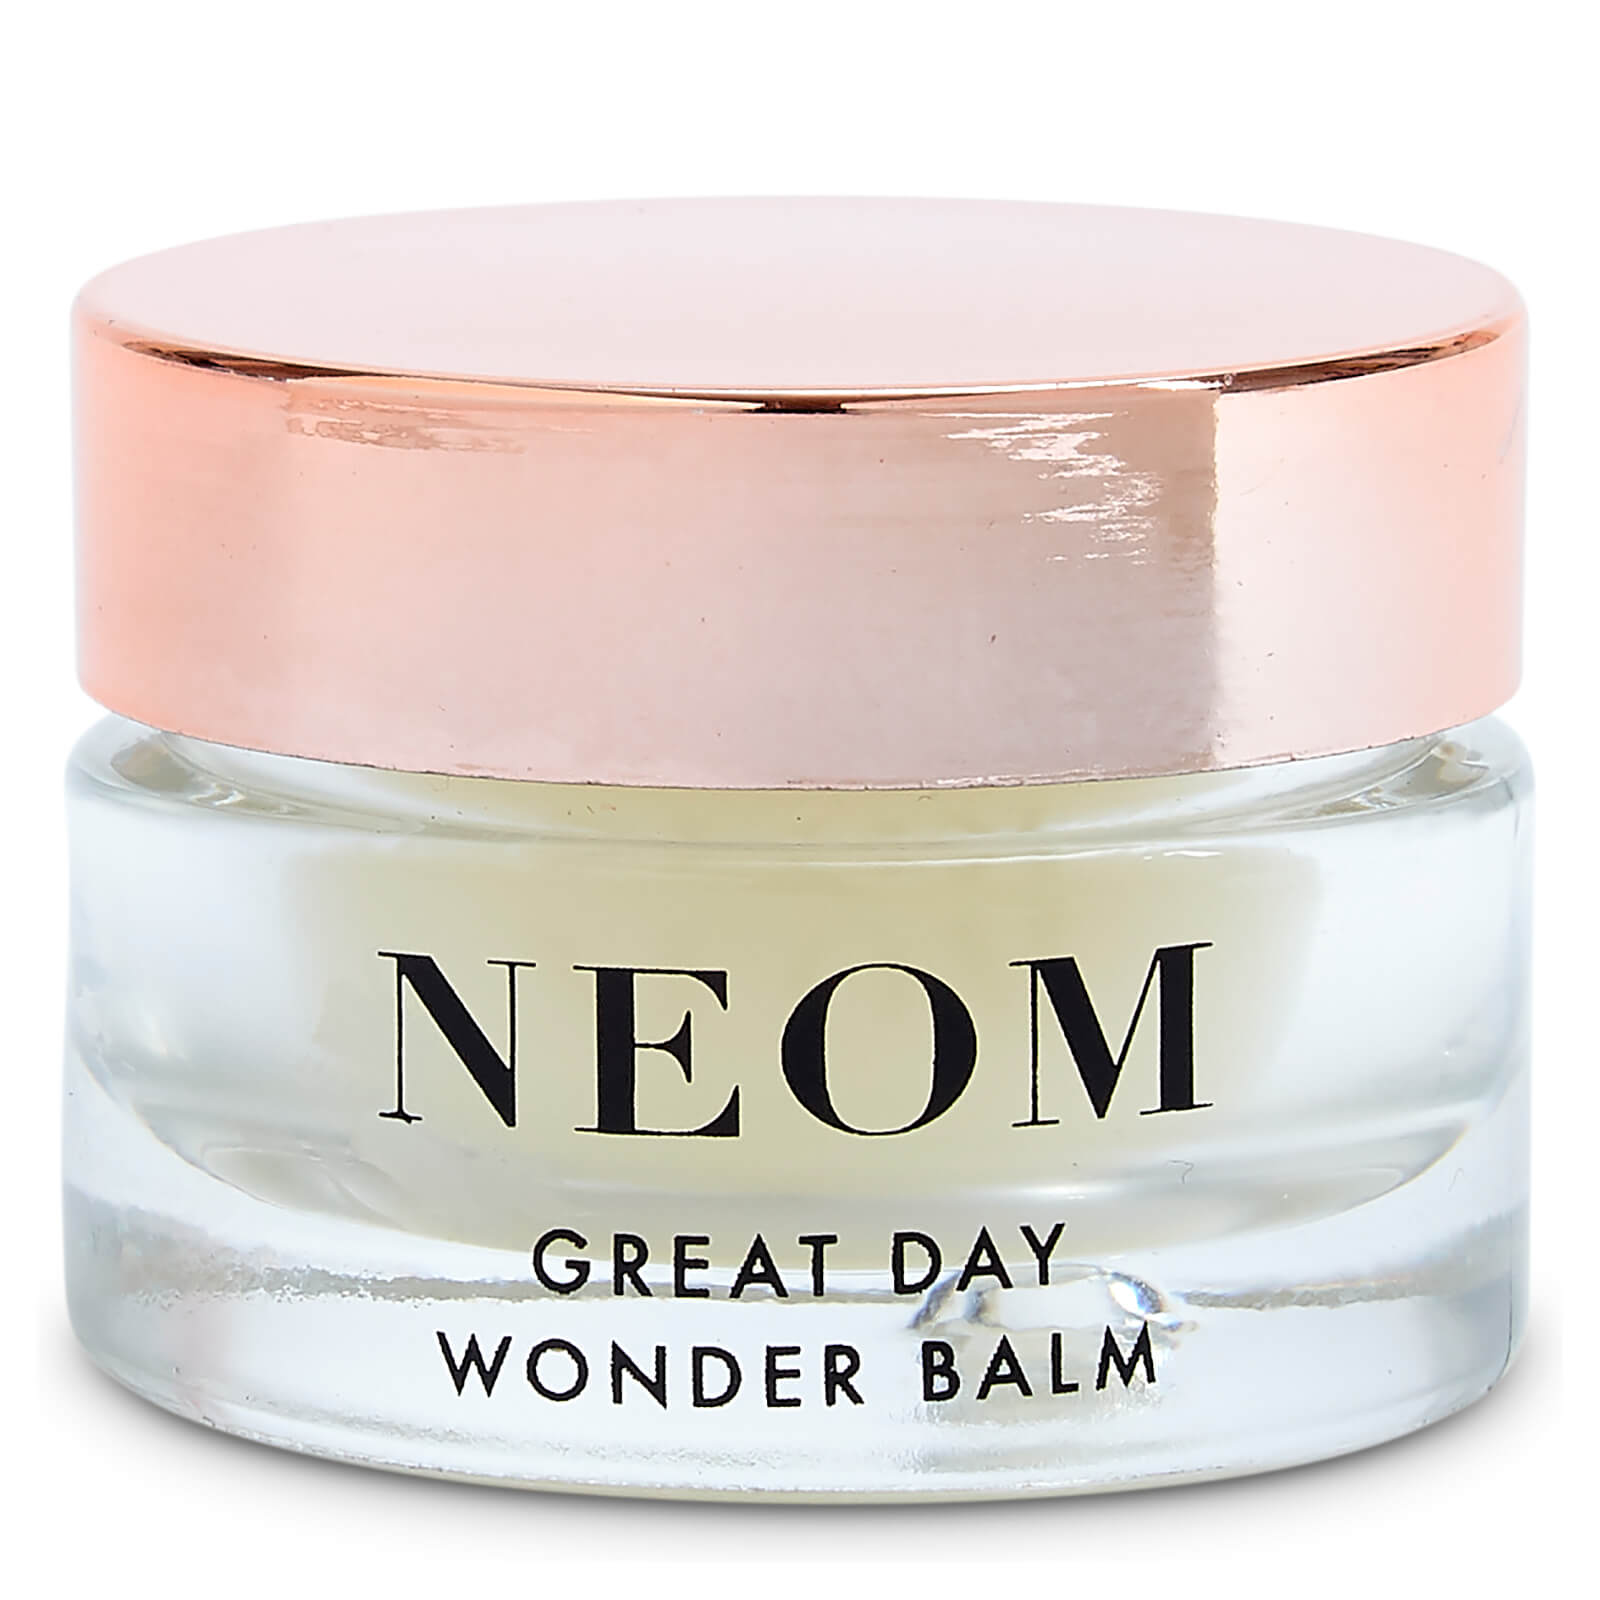 NEOM Great Day Wonder Balm 12g